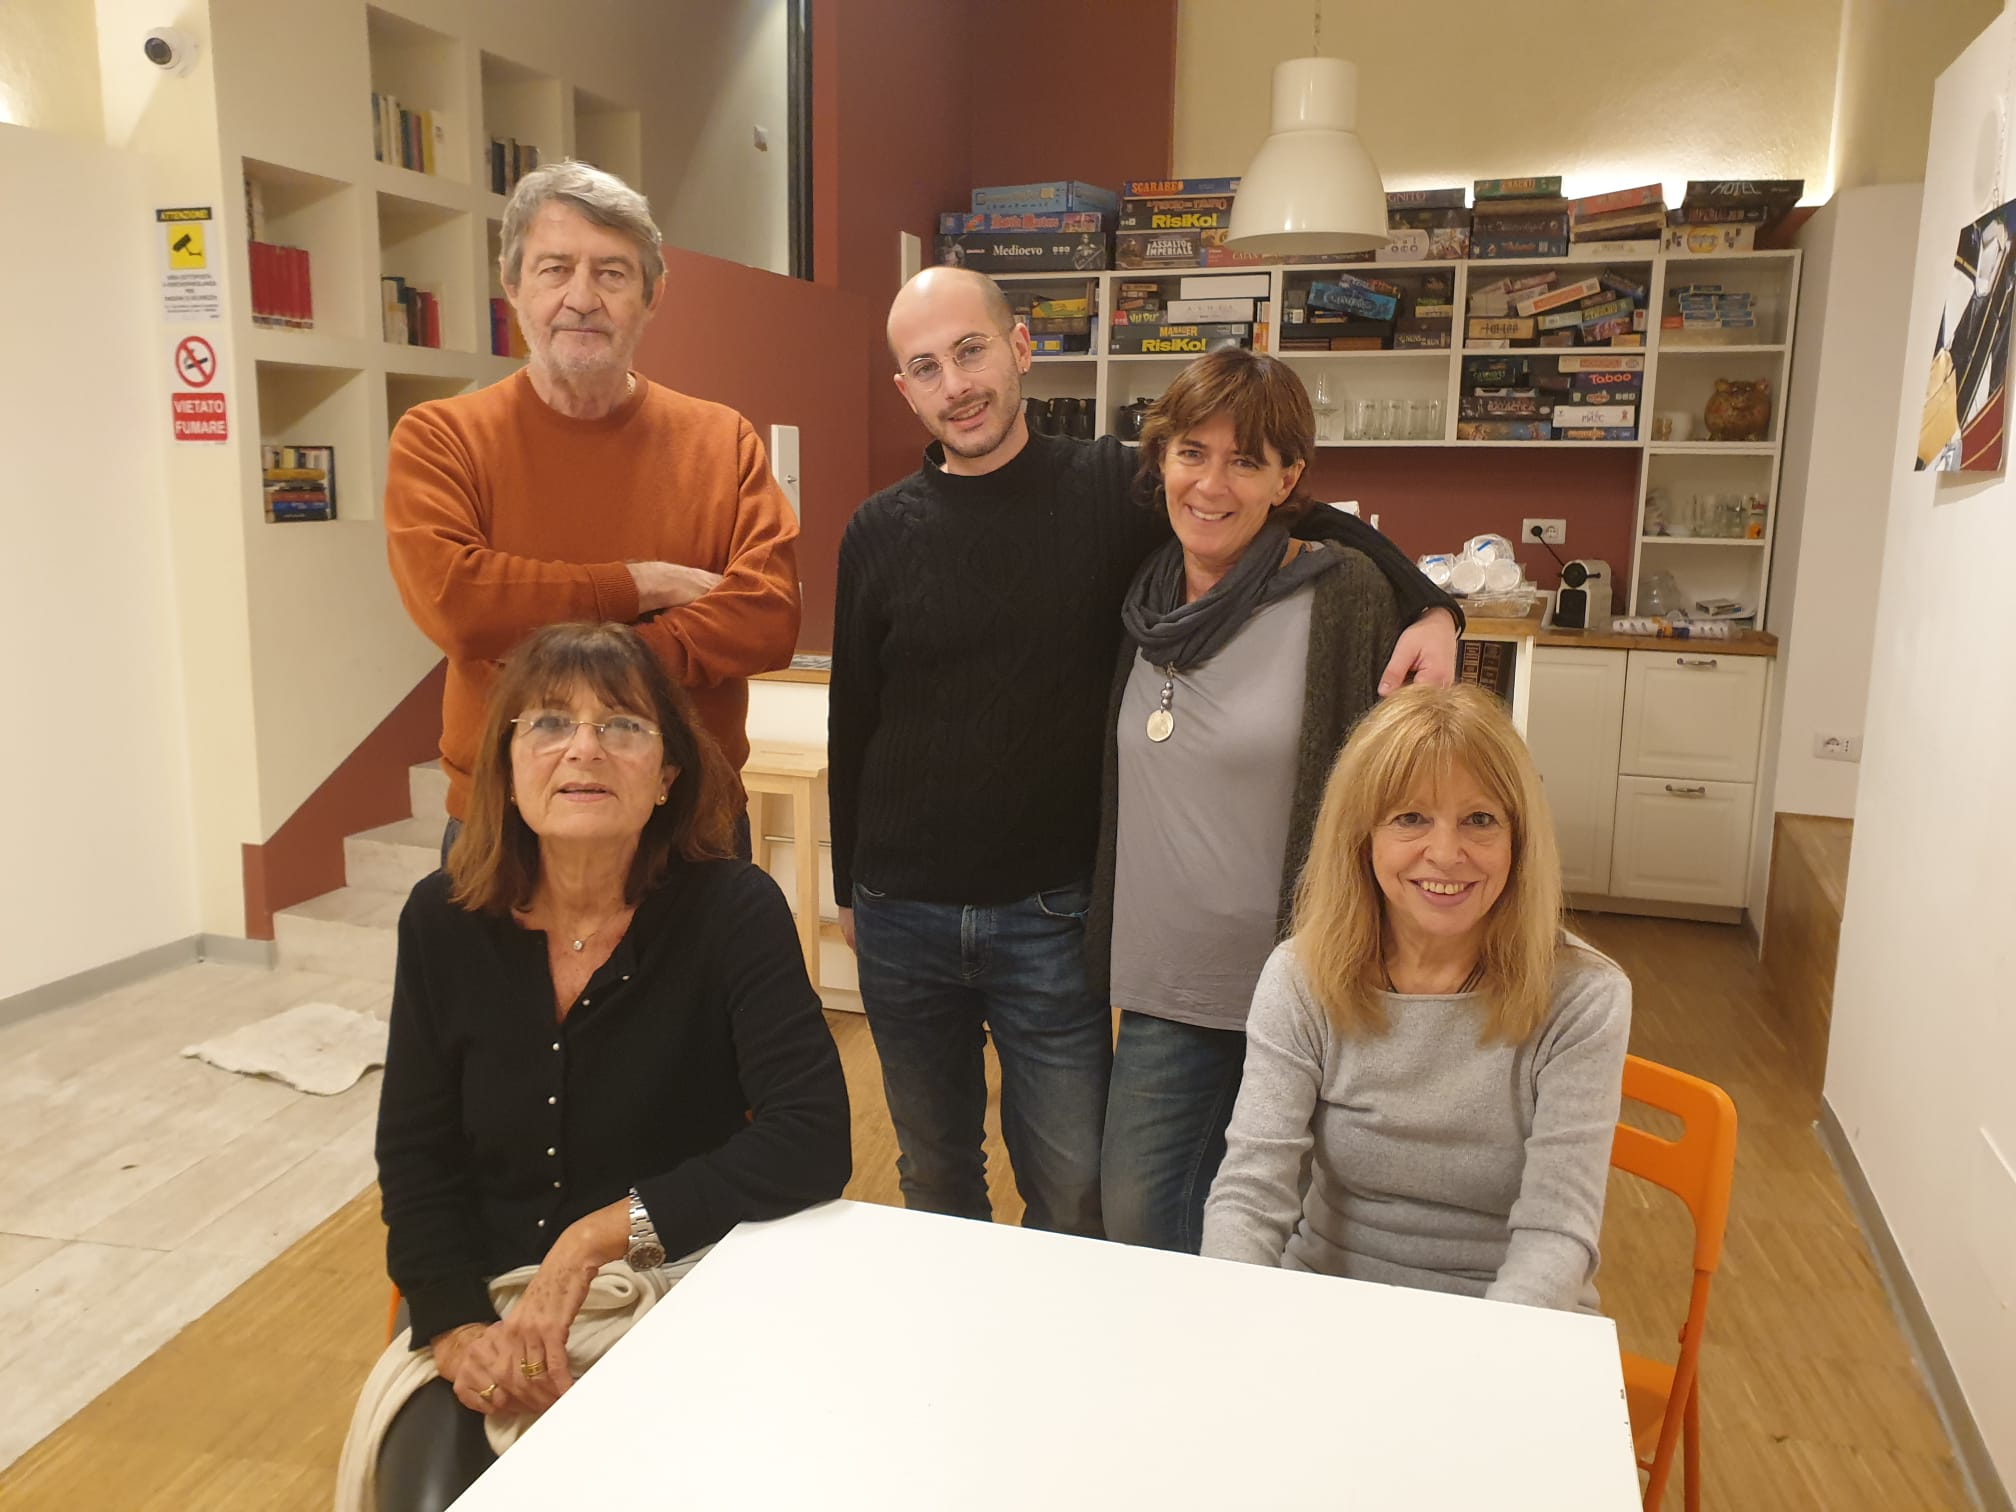 Da sinistra: Mauro Bandinelli, Patrizia Sacco, Riccardo Leolini, Cristina Ottaviano, Vittoria Pagliuca